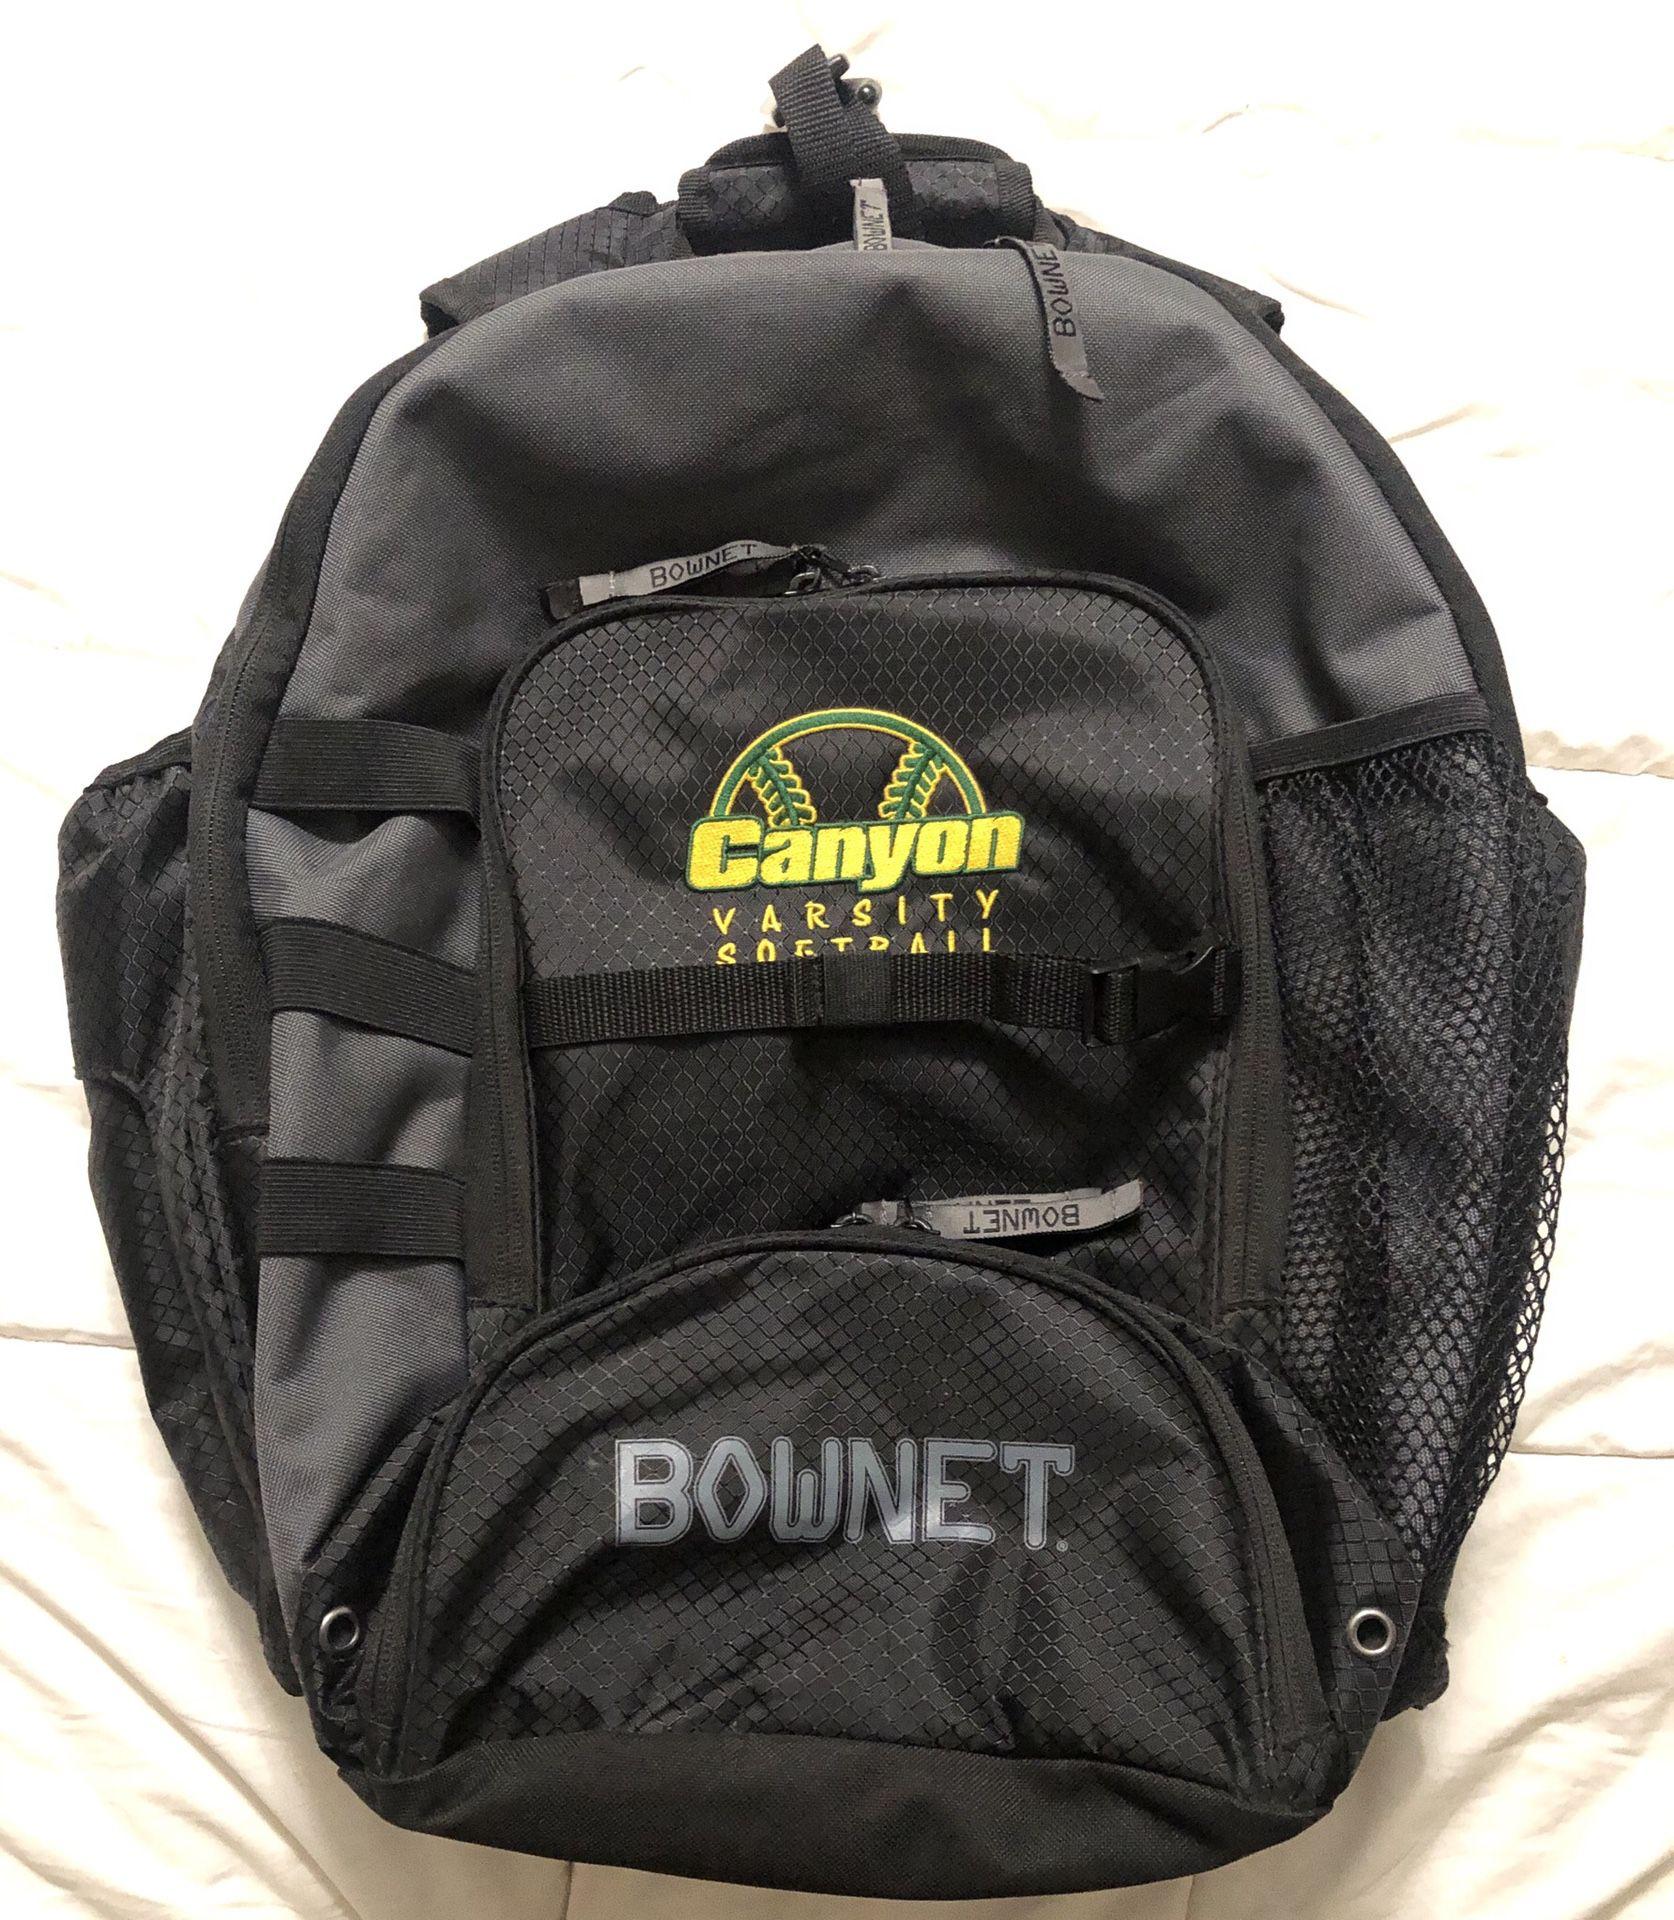 Bownet Baseball / Softball Backpack